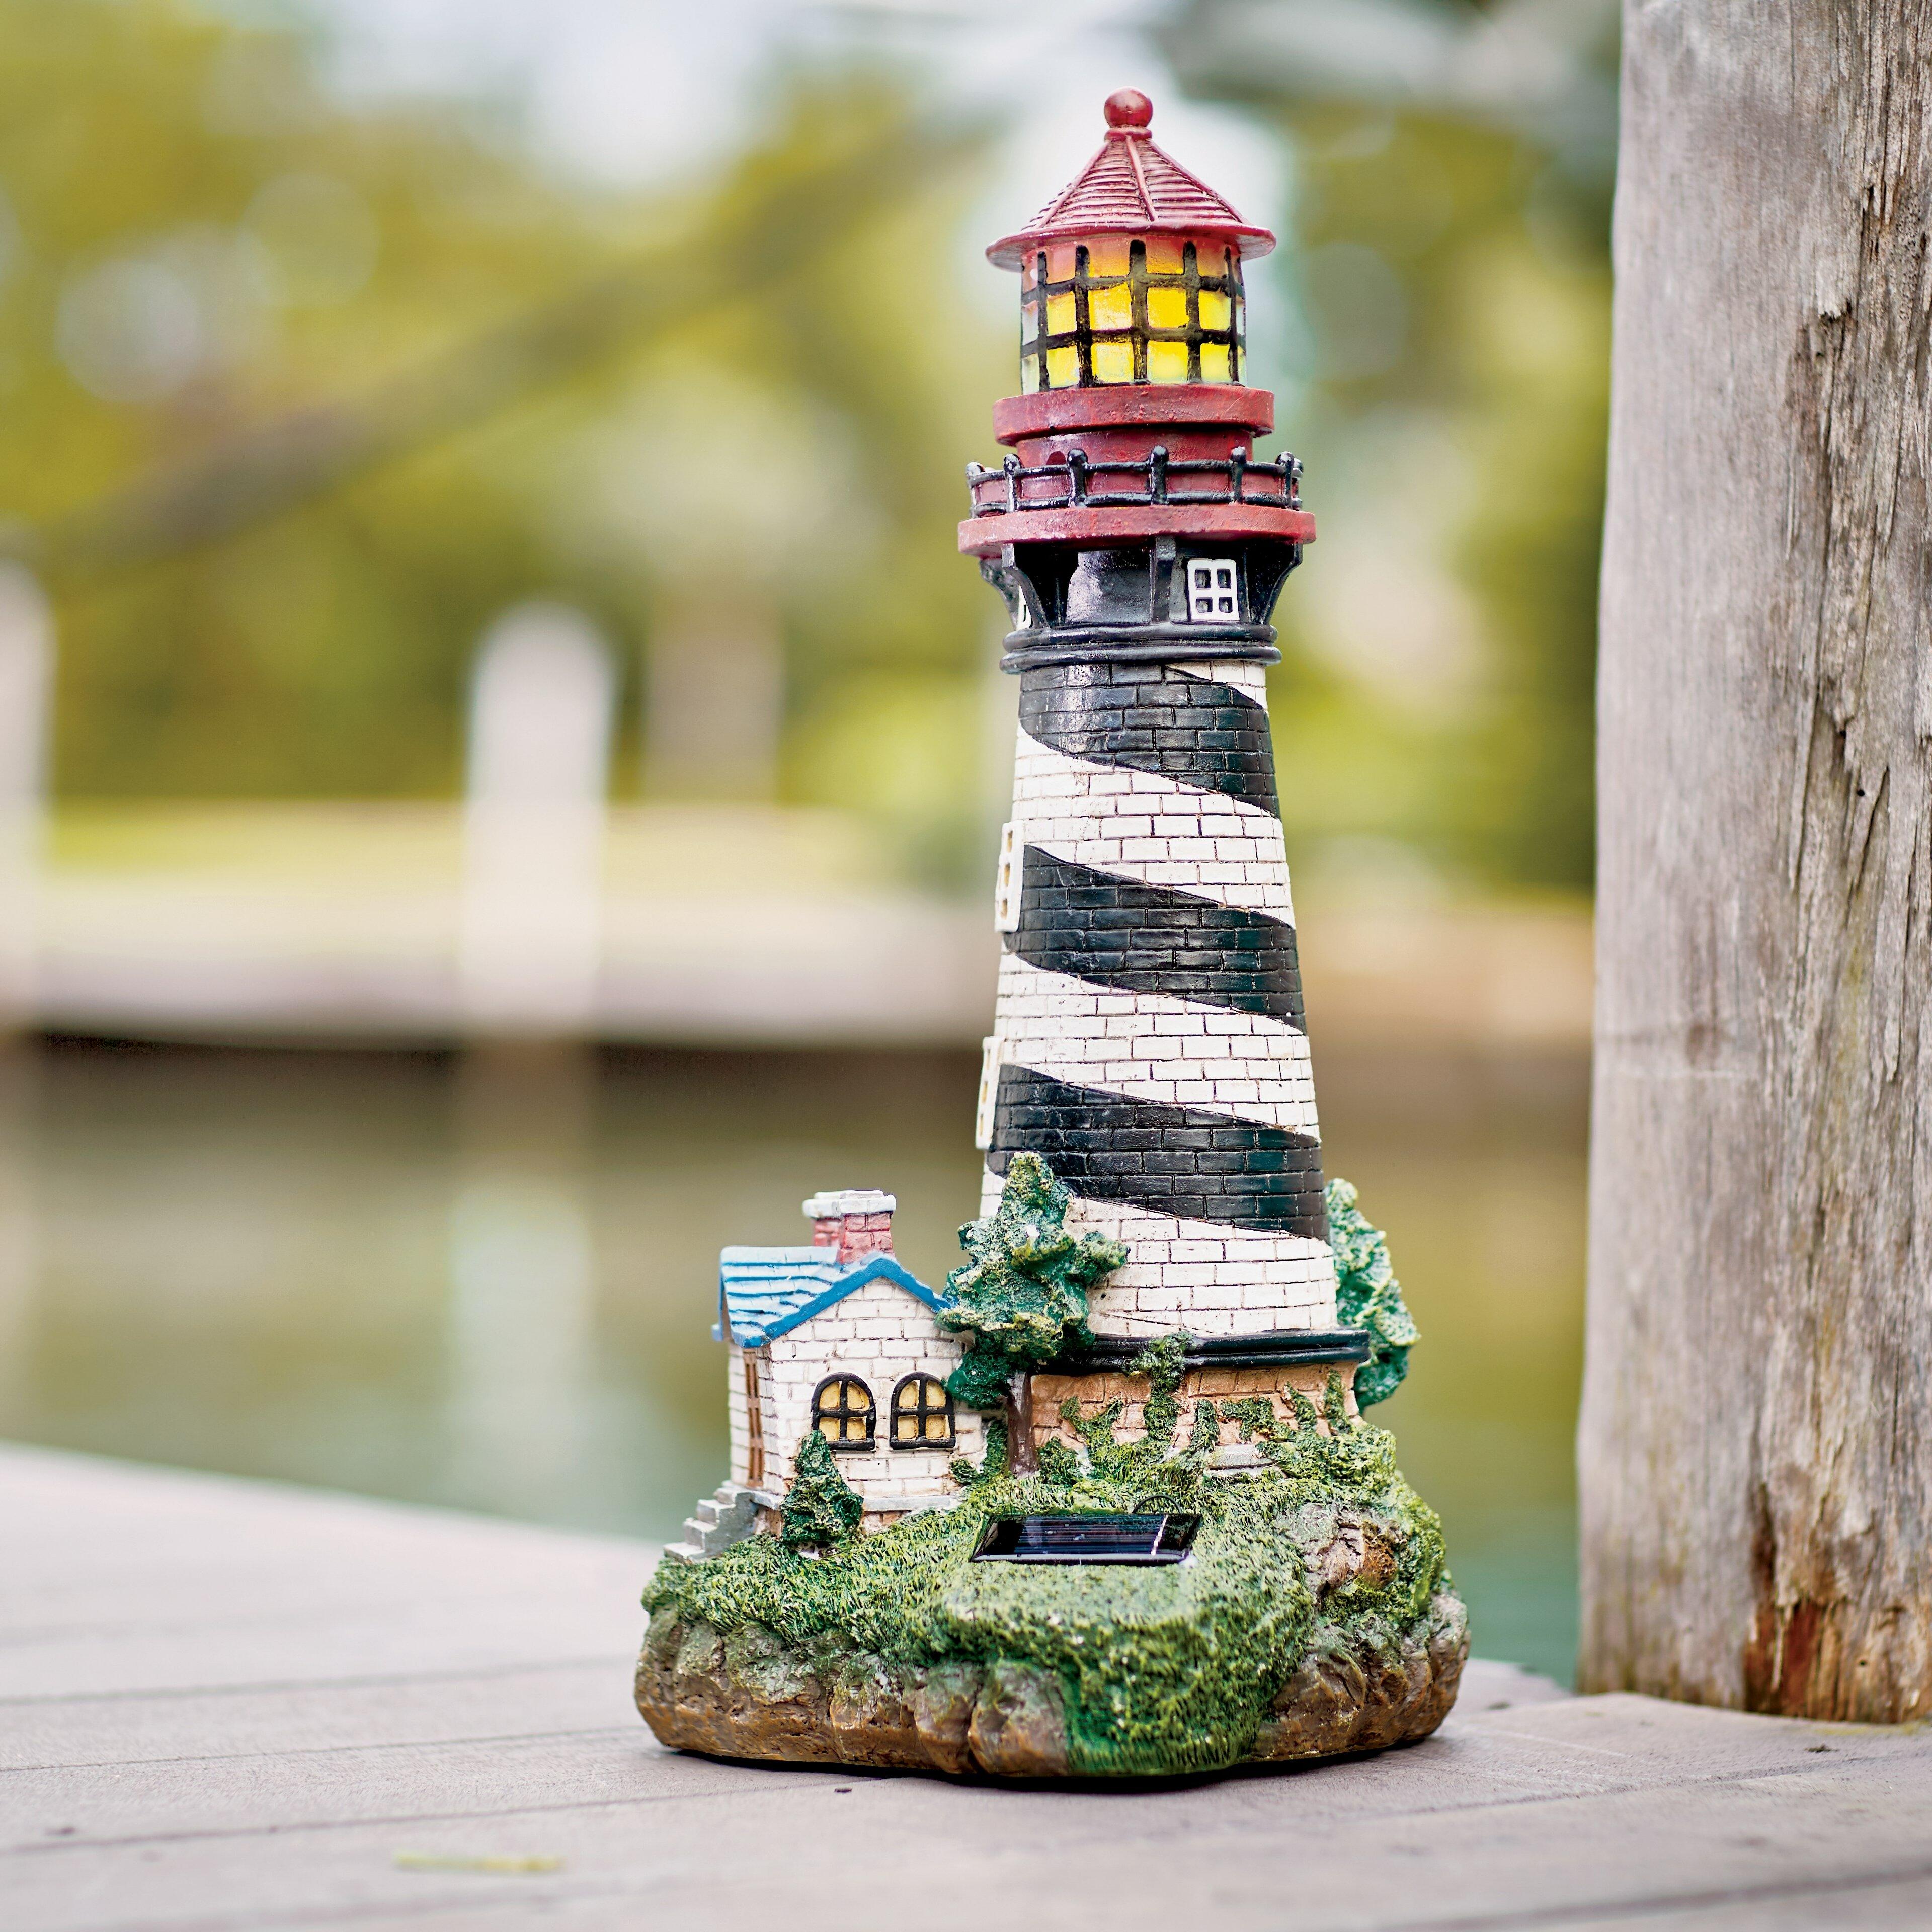 Breakwater Bay Groton Solar Powered Garden Lighthouse Decorative Lantern u0026 Reviews   Wayfair & Breakwater Bay Groton Solar Powered Garden Lighthouse Decorative ...